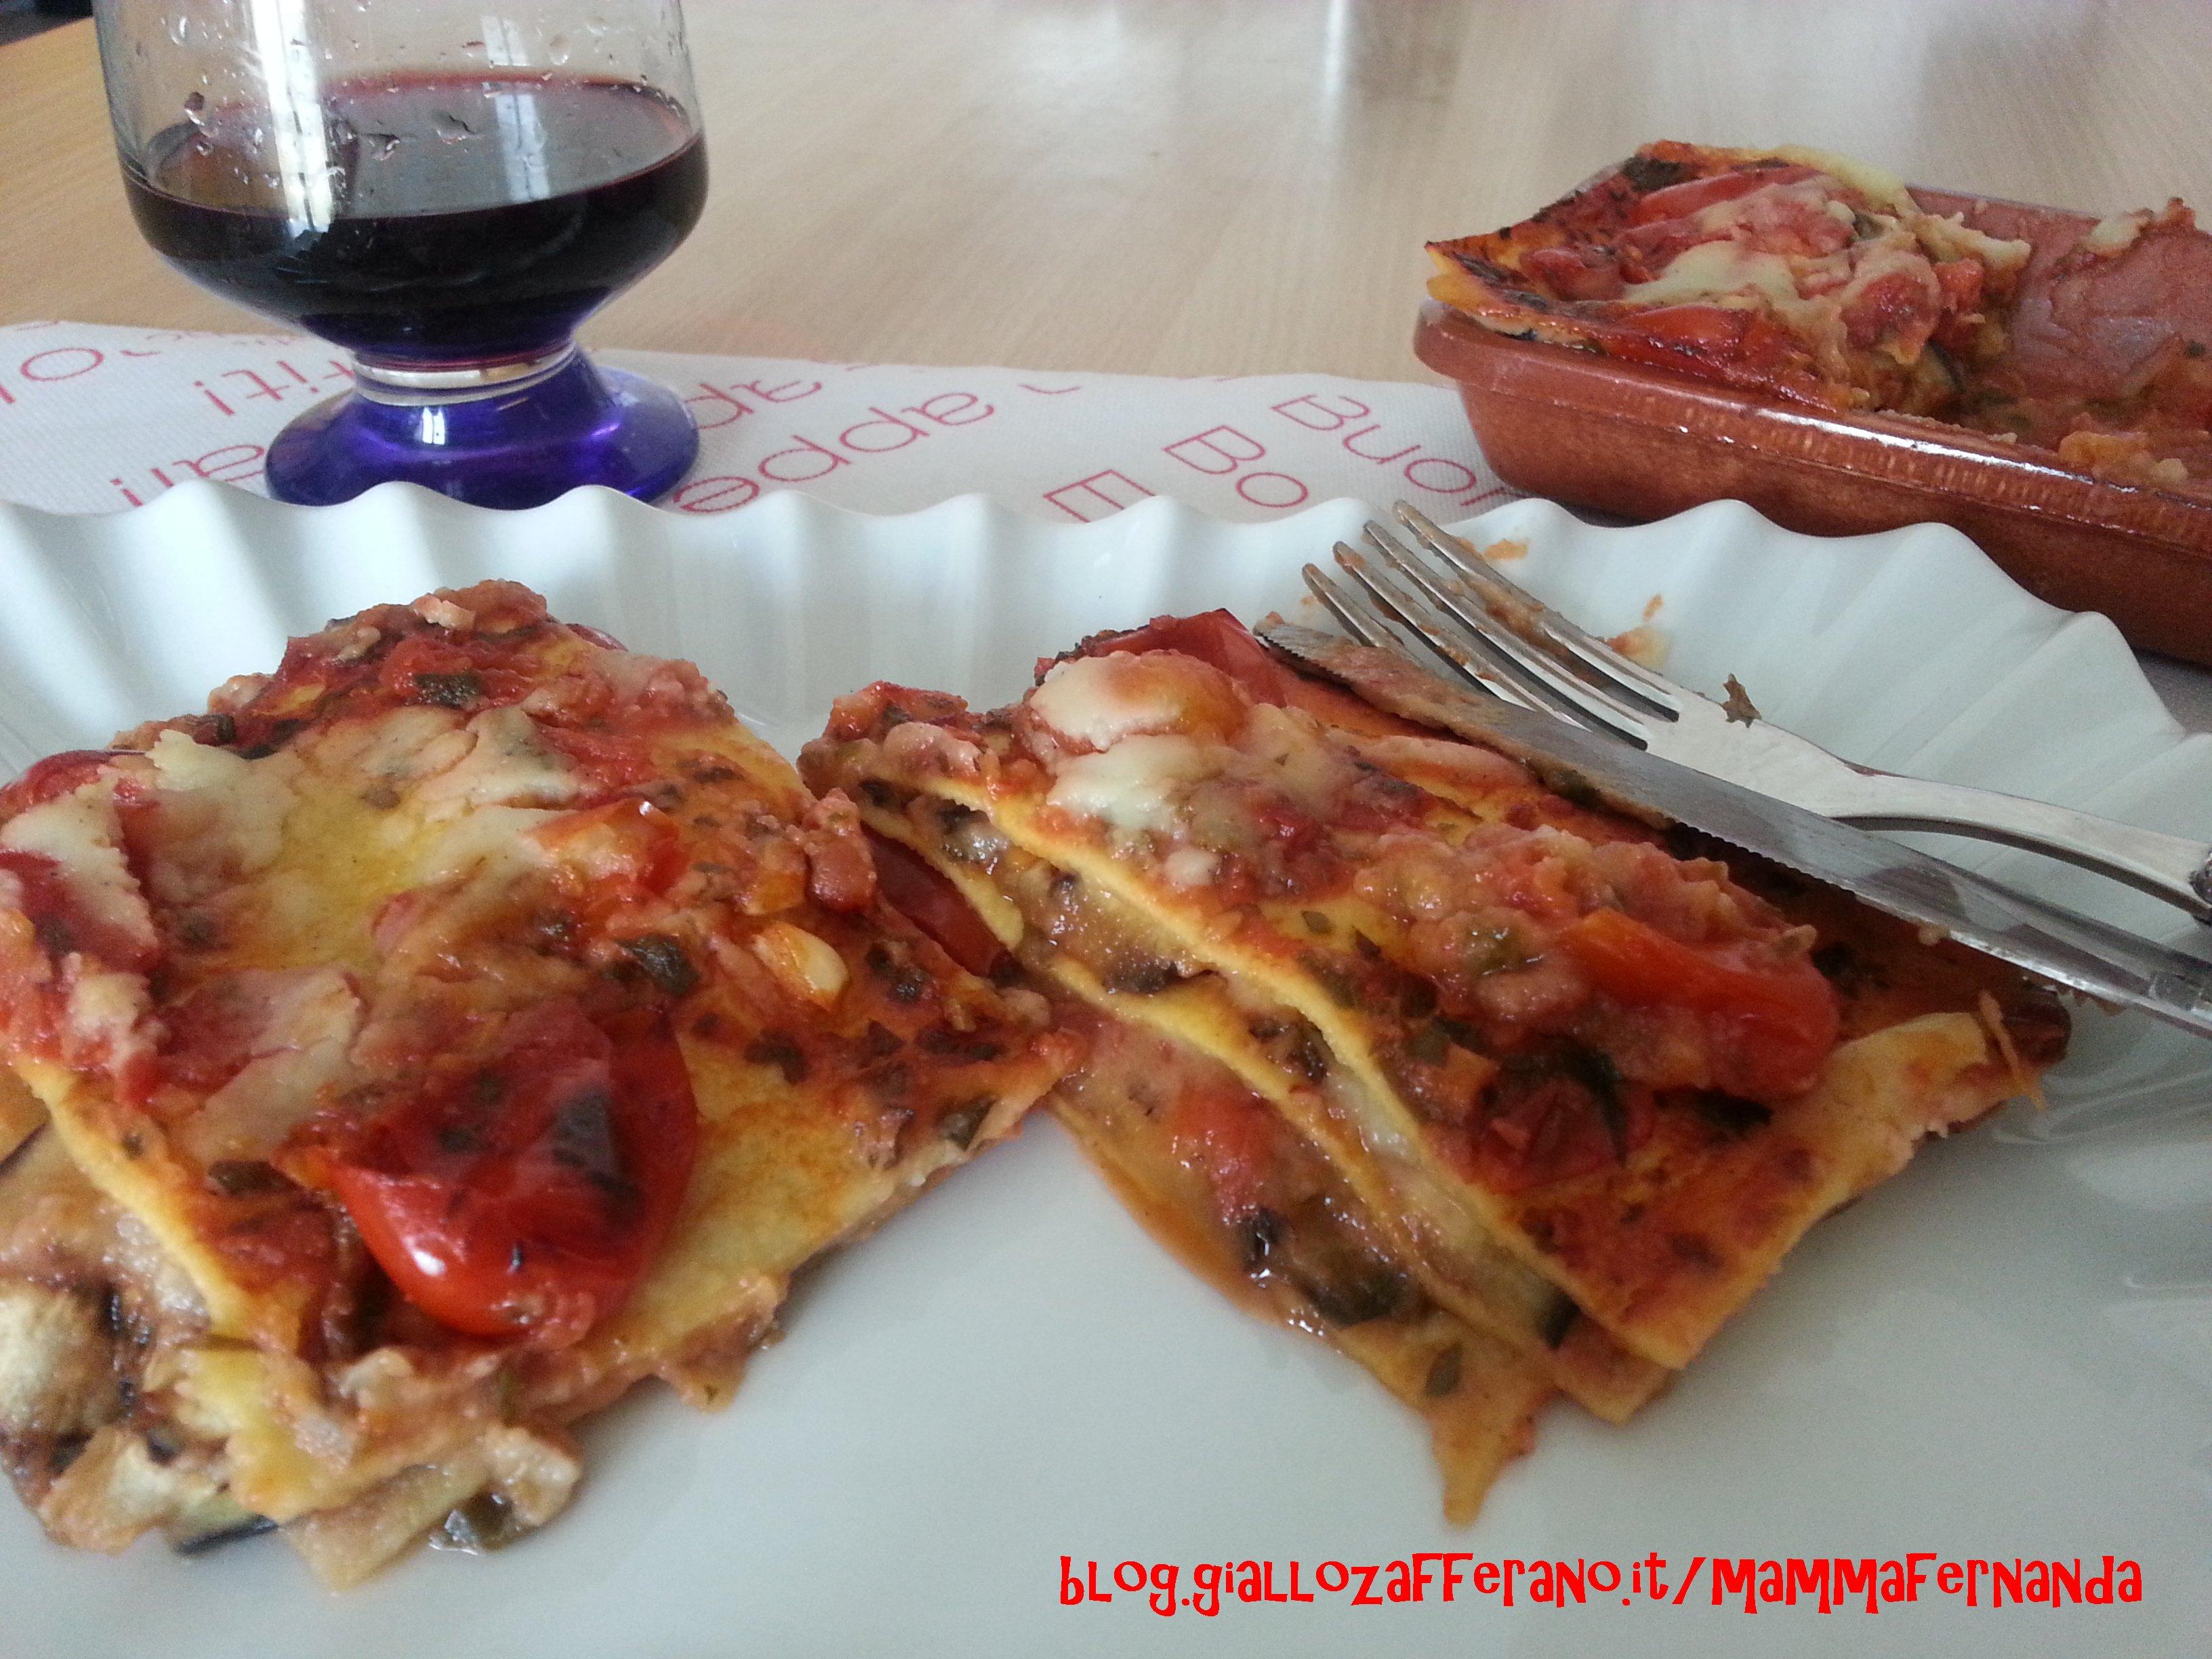 Lasagne con melanzane e crema al sedano rapa